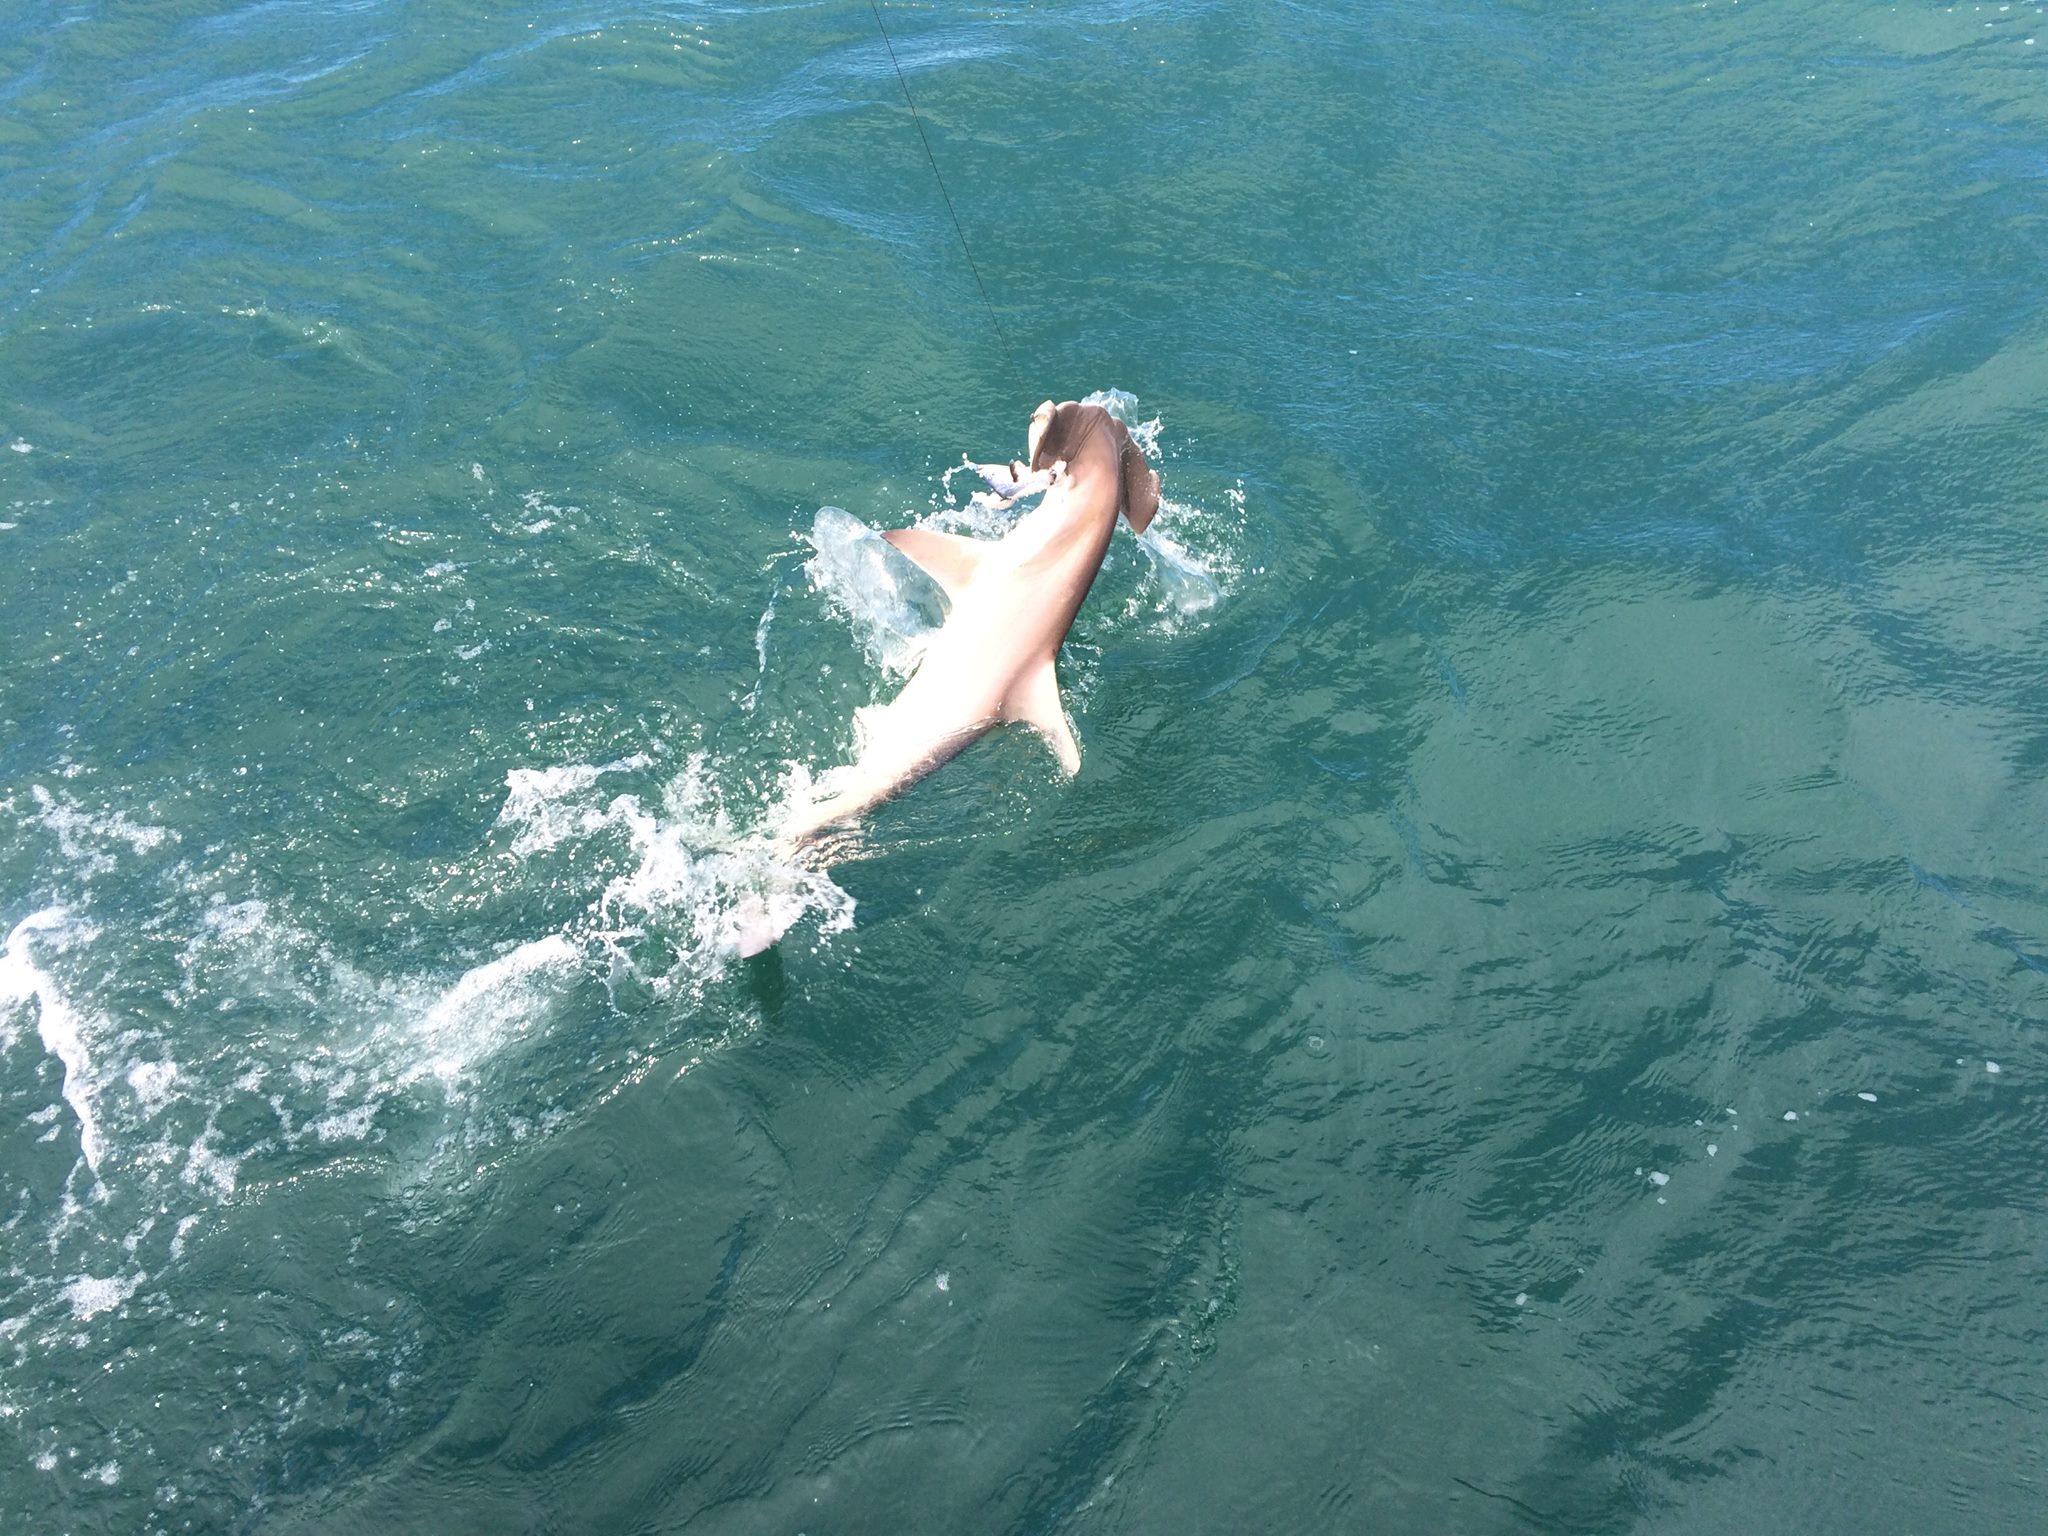 Hammerhead Shark in ocean swimming